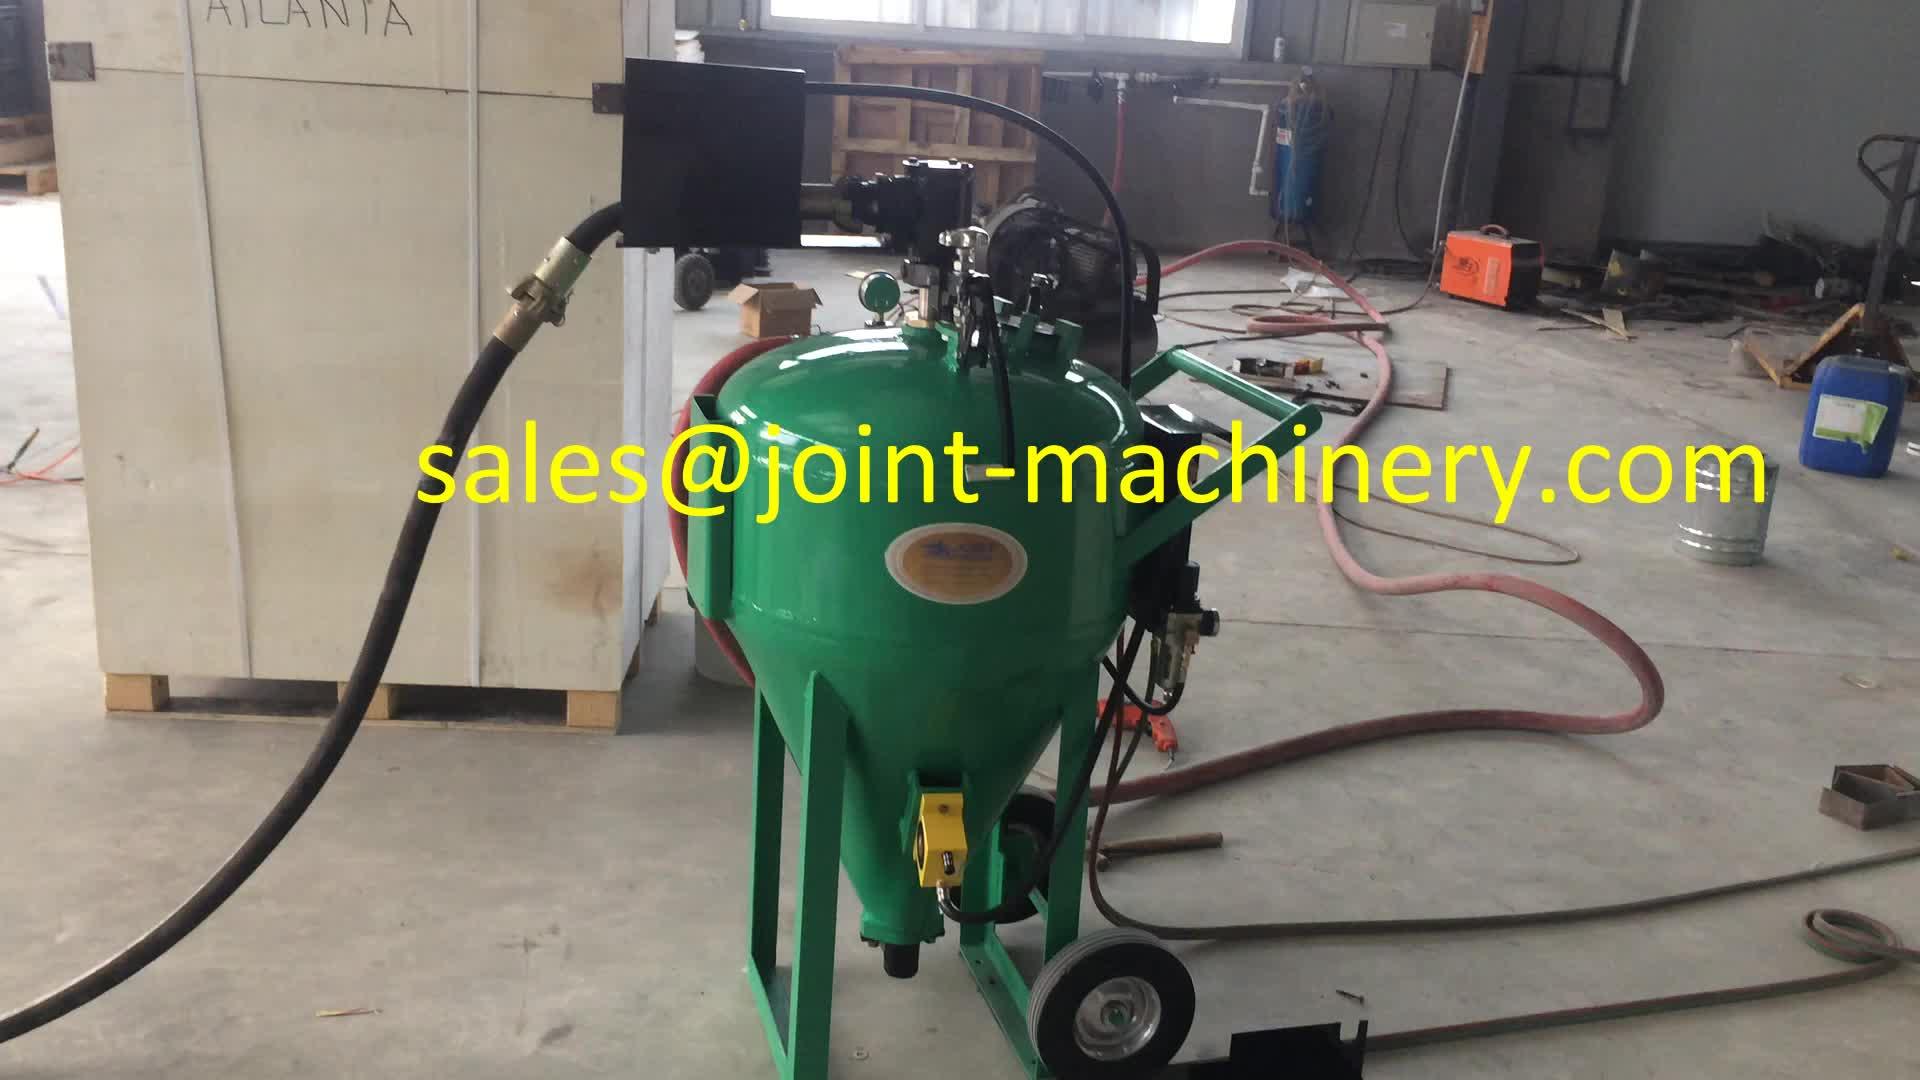 Dustless Sand Blasting Machine Db225 Industrial Electric